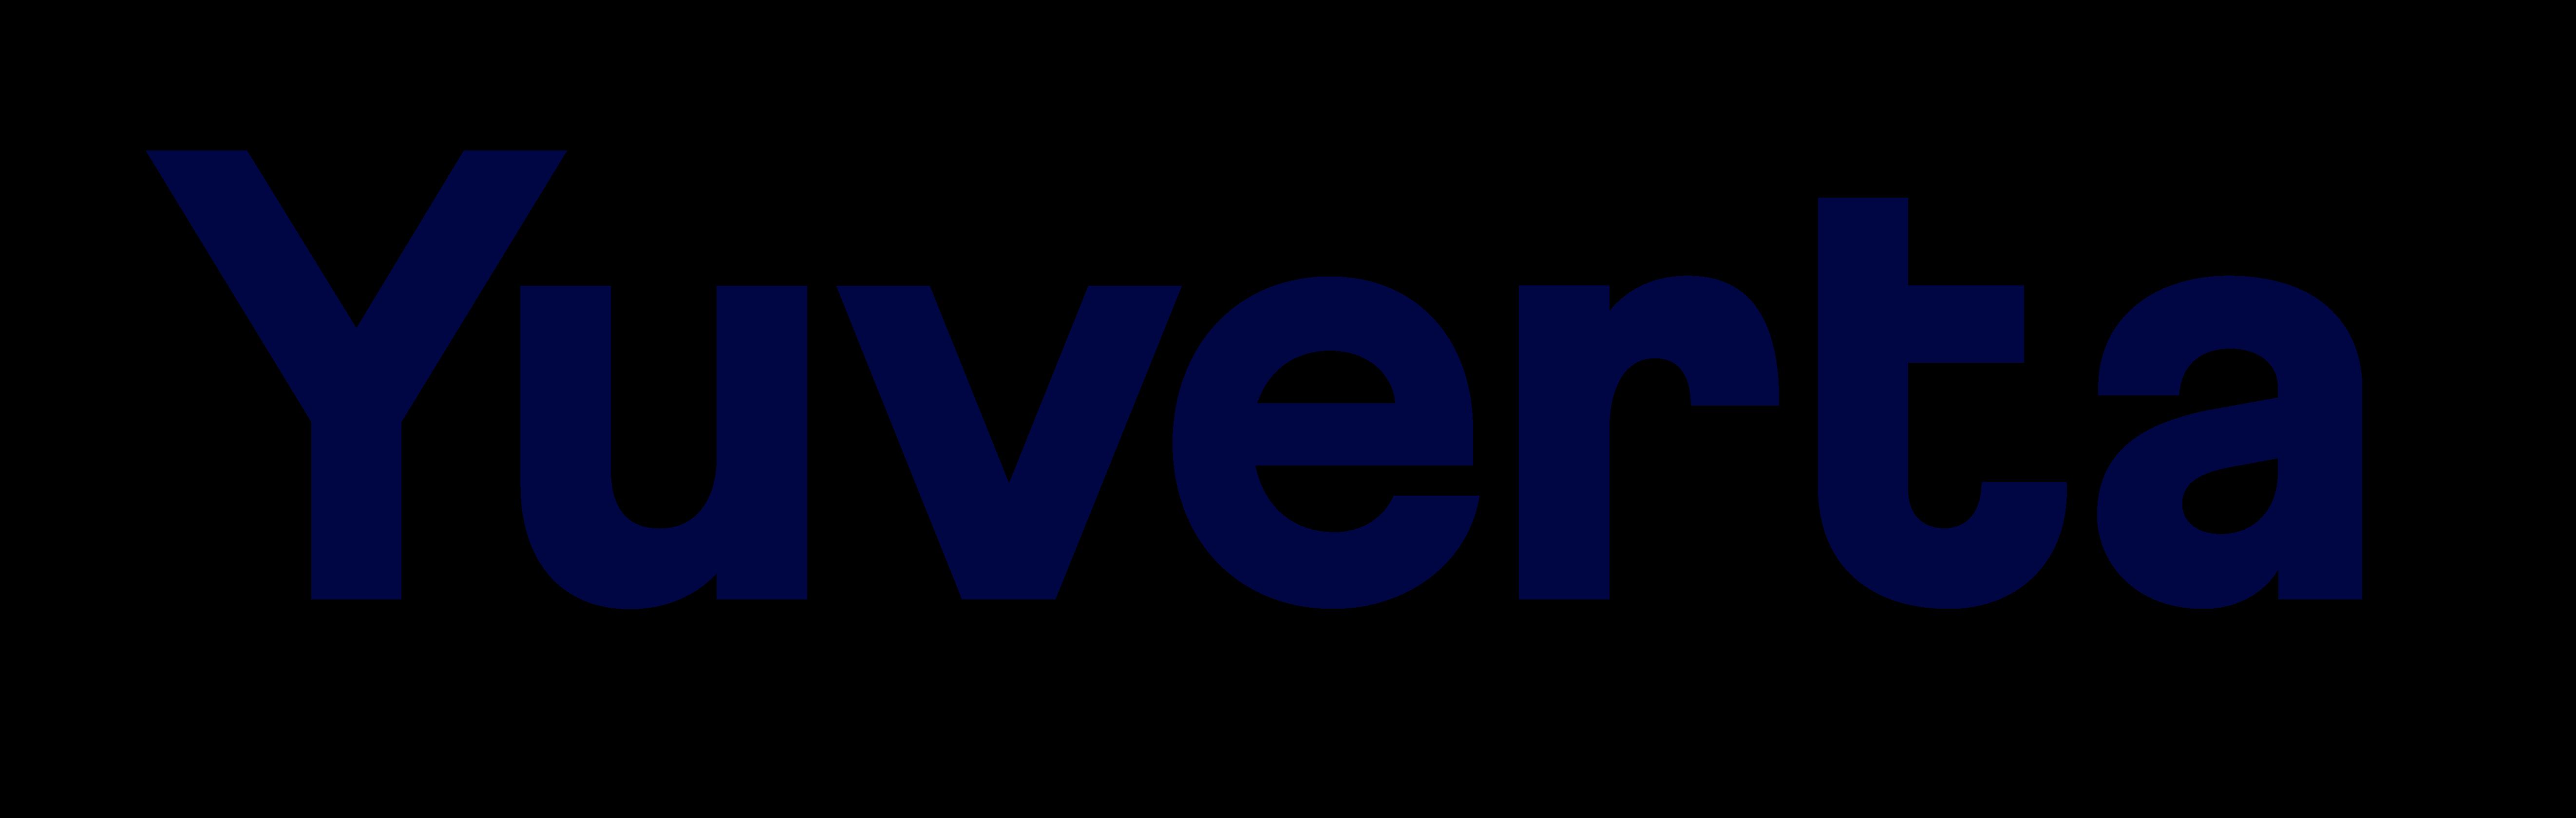 Yuverta vmbo Nijmegen